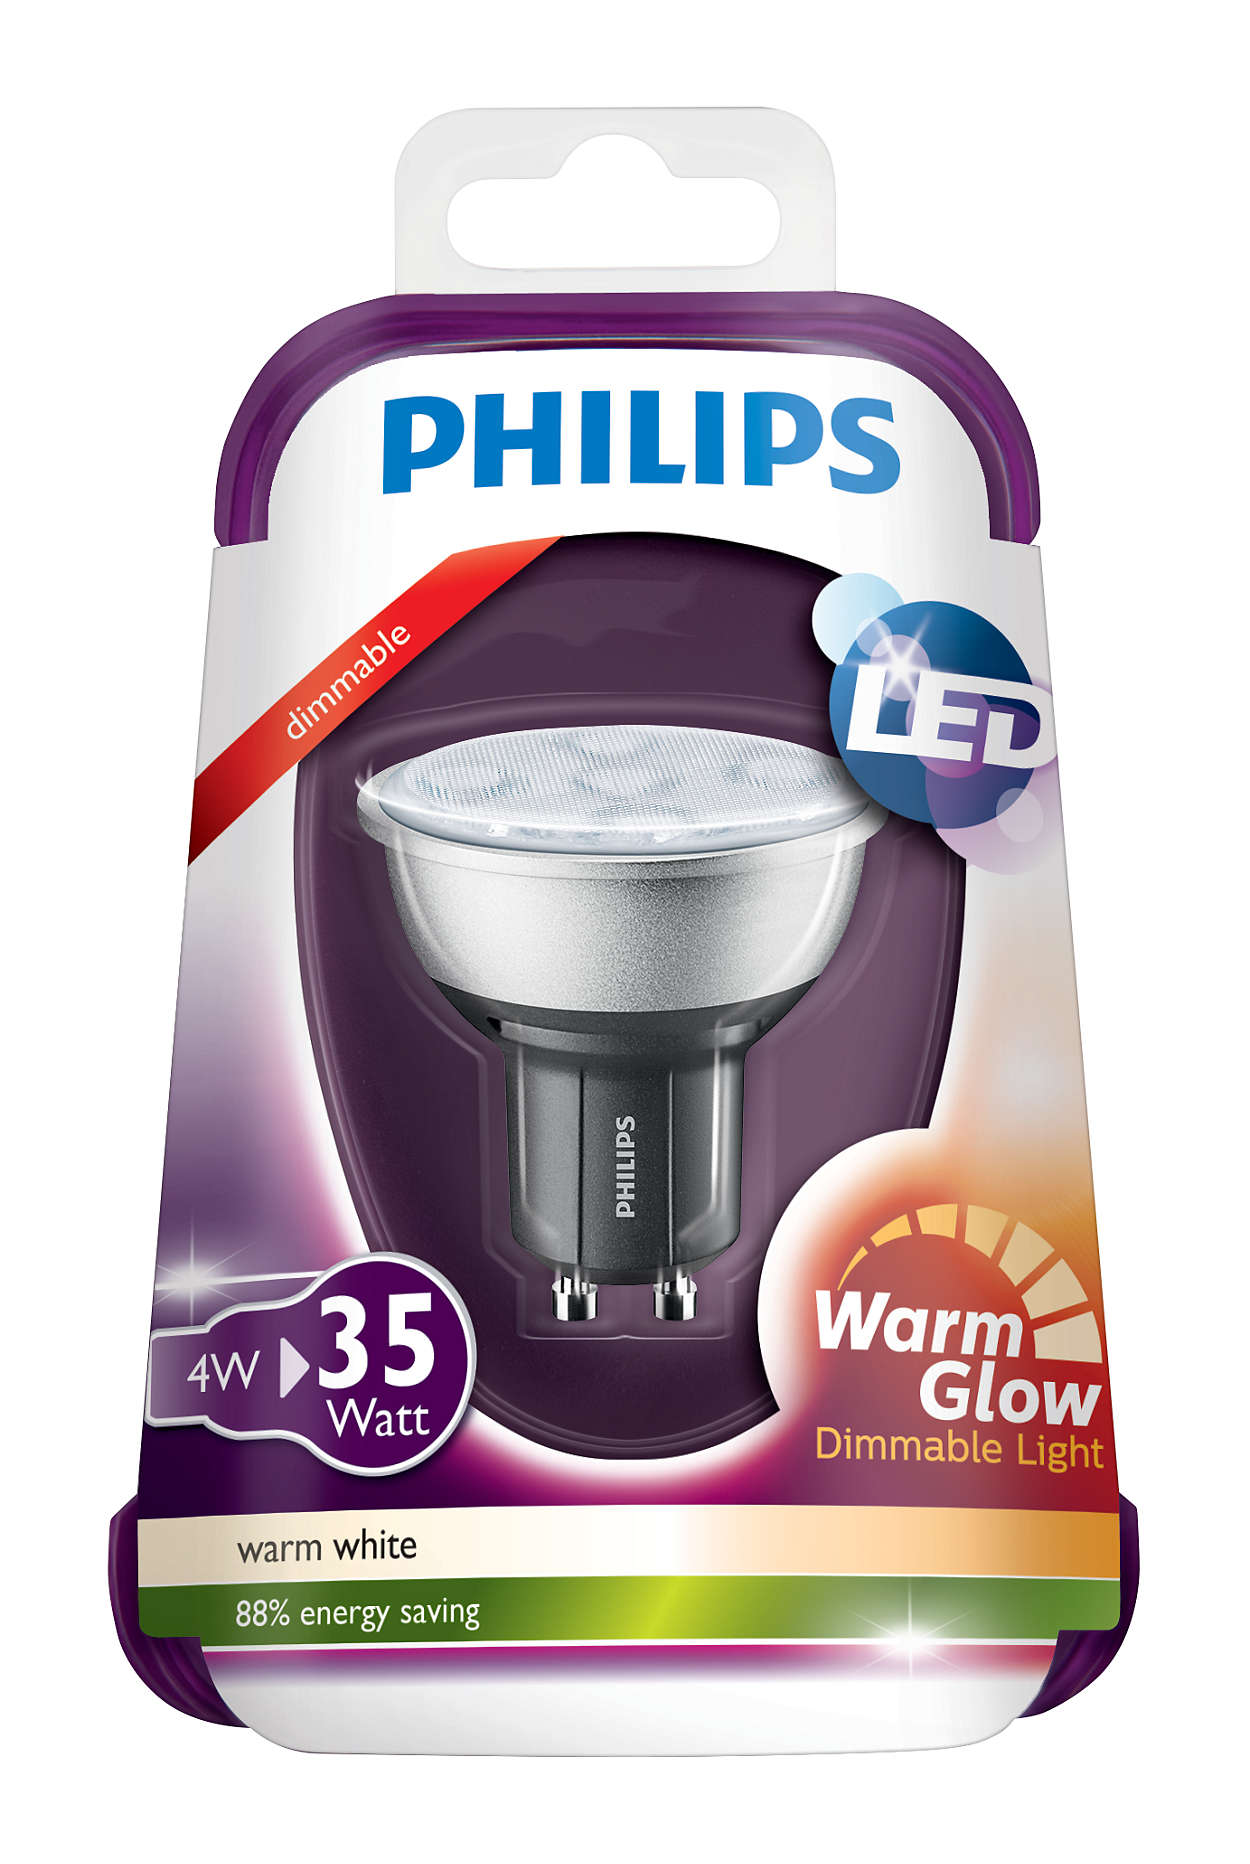 philips-led-gu10 Luxus Philips Led Gu 10 Dekorationen